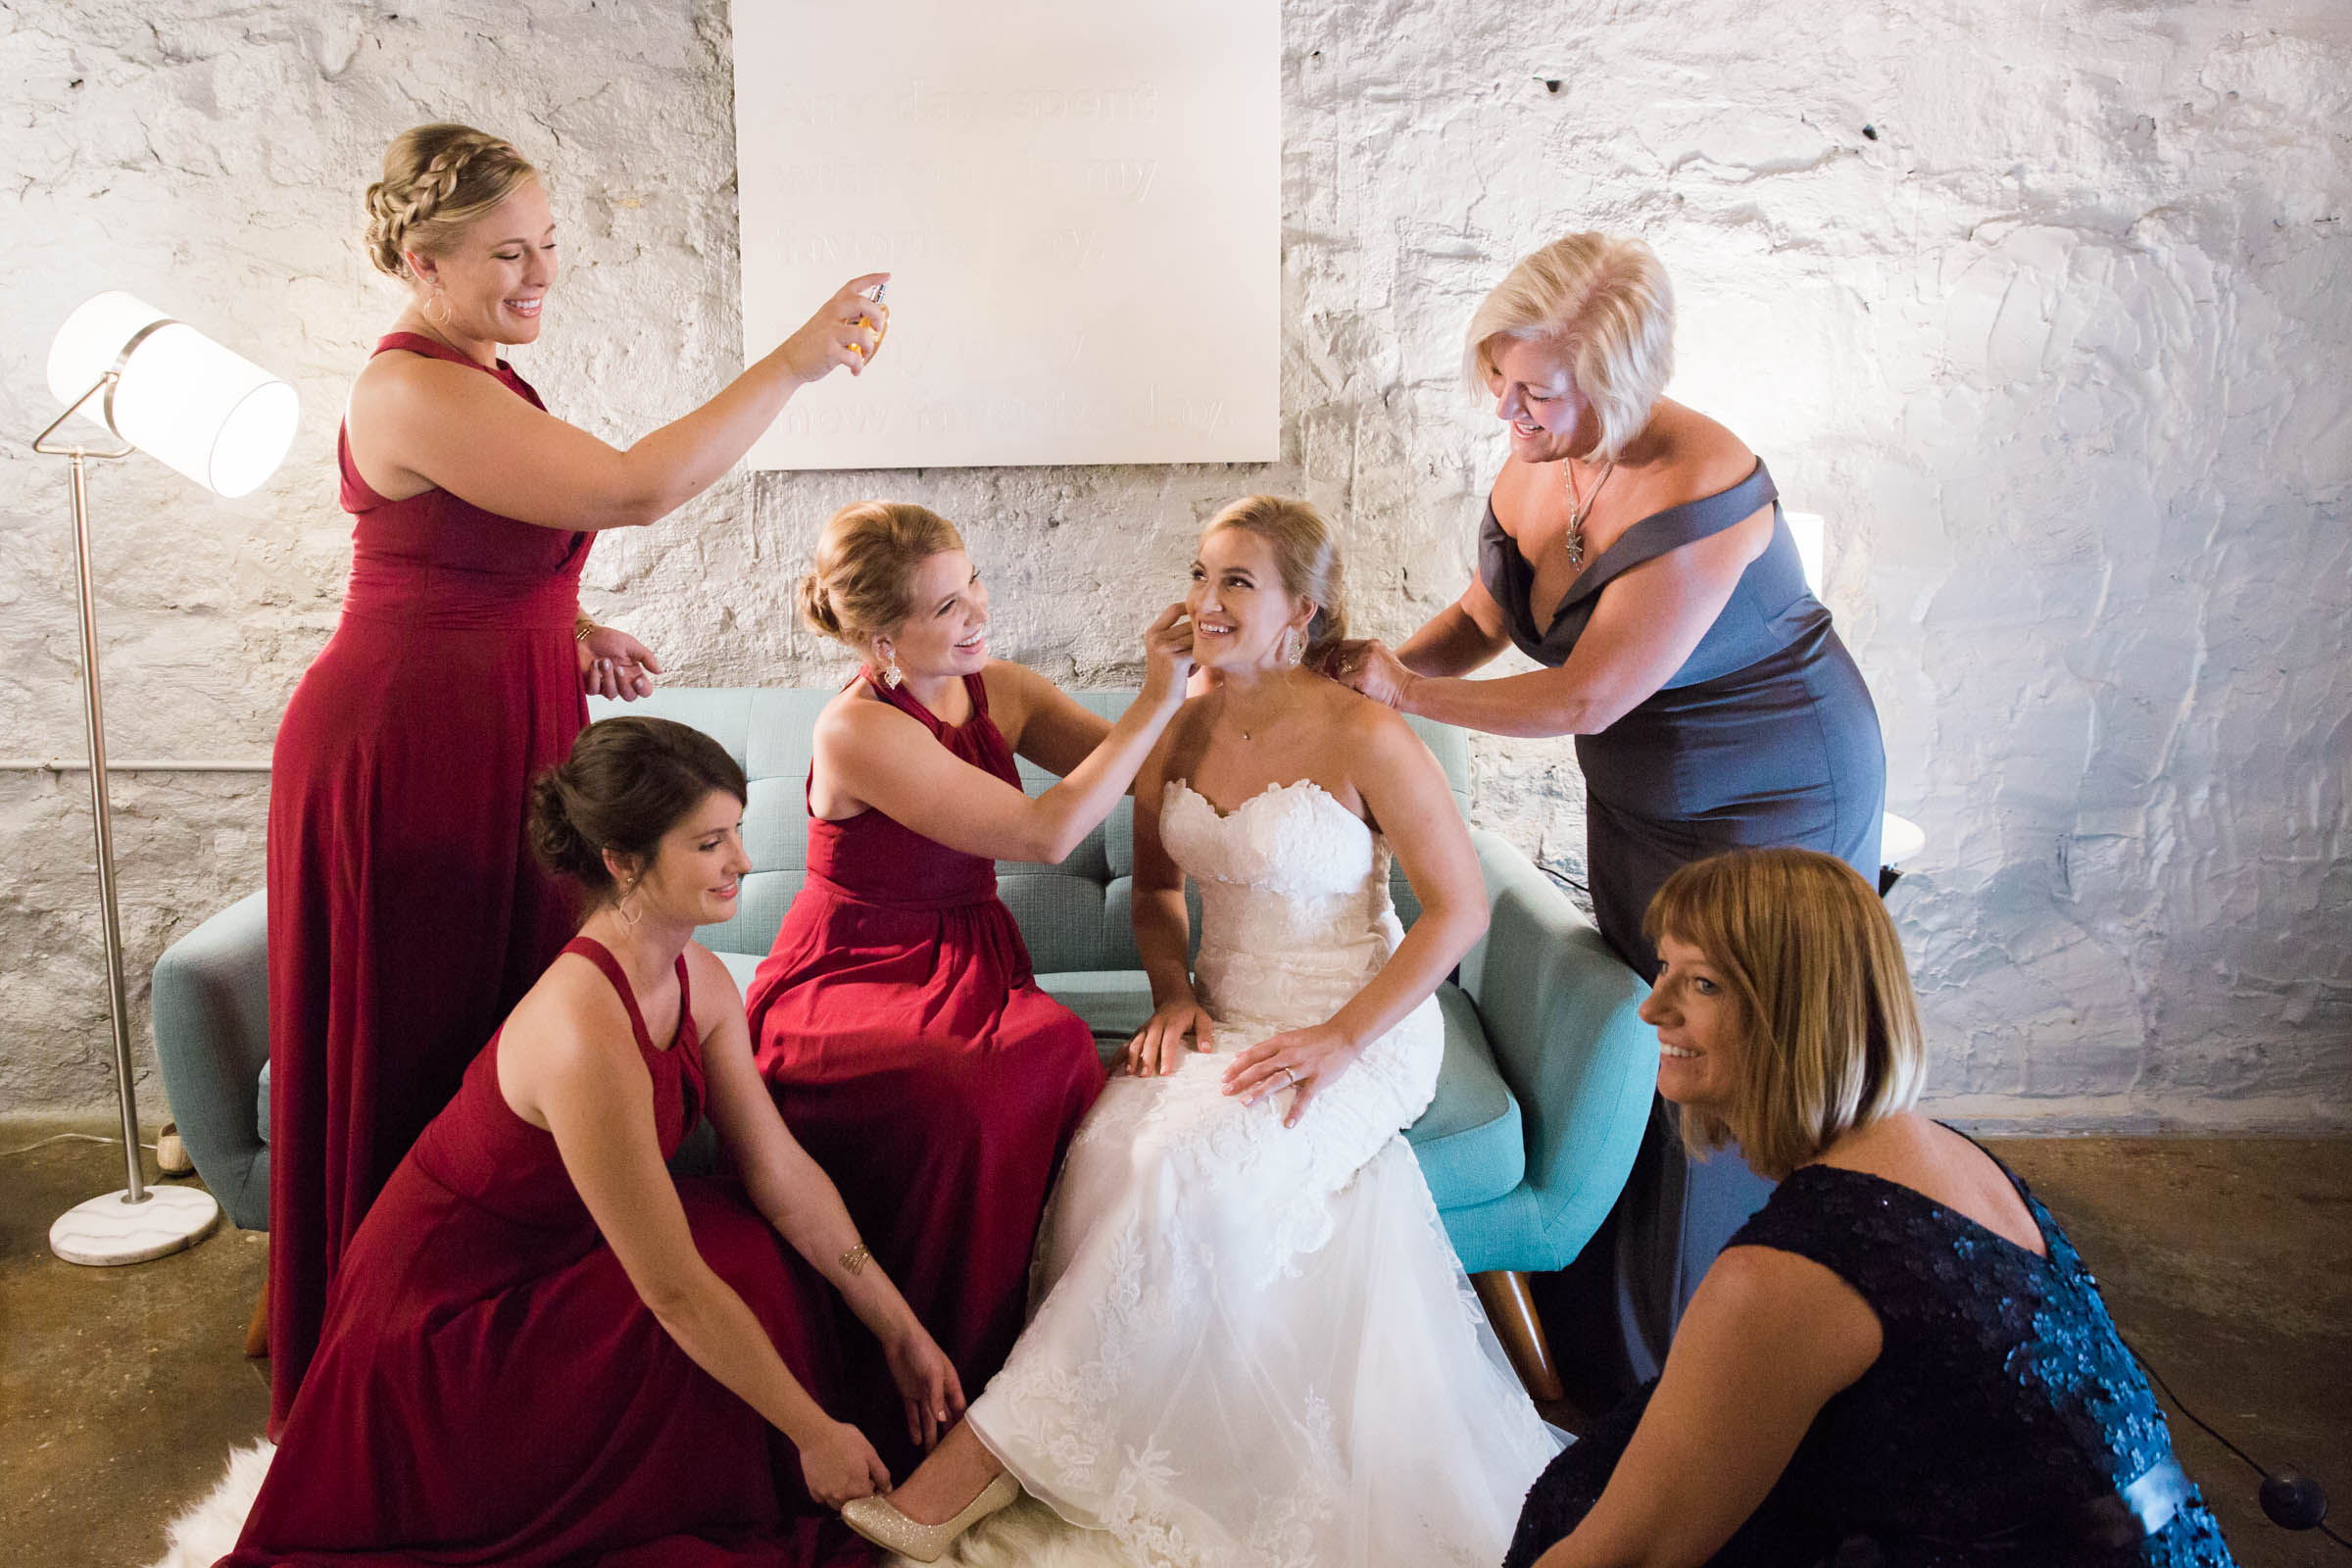 Ellicott City Wedding Photography by Megapixels Media Top Maryland Wedding Photographer Bride Tribe Photo.jpg